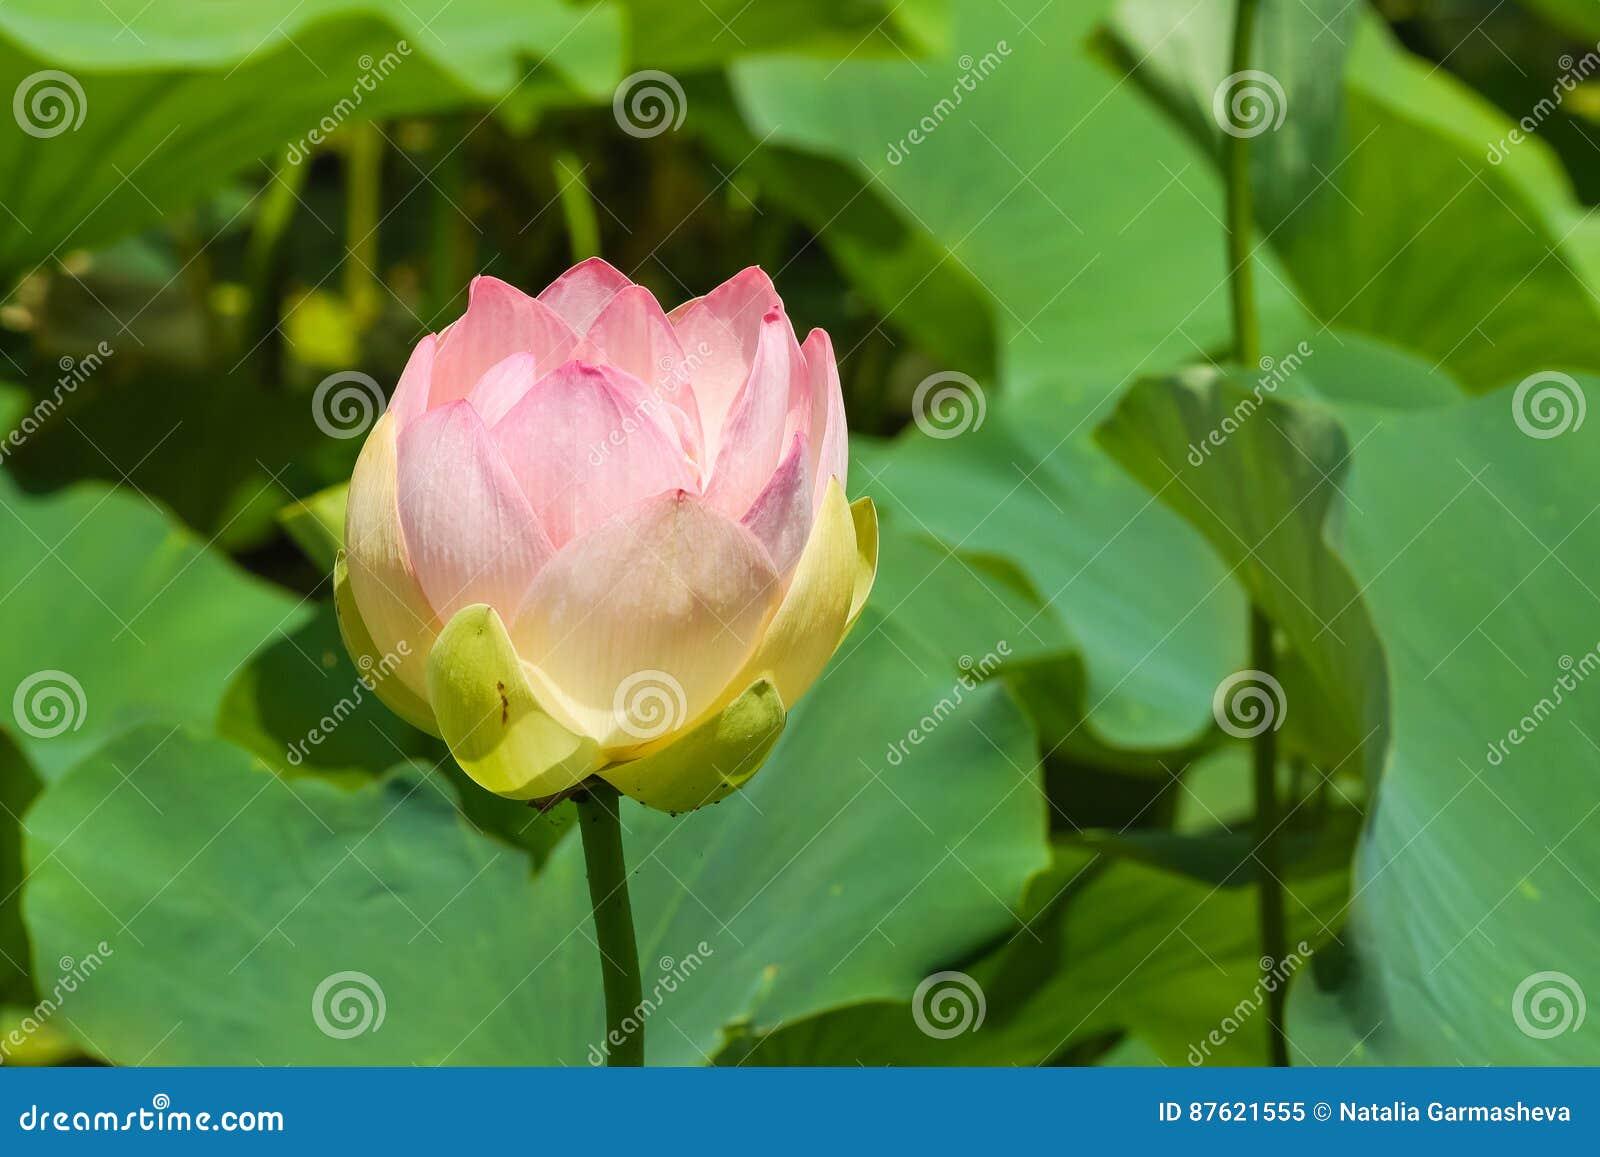 Flower Hindu Lotus Lat Nelumbo Nucifera Is A Perennial Herbaceous